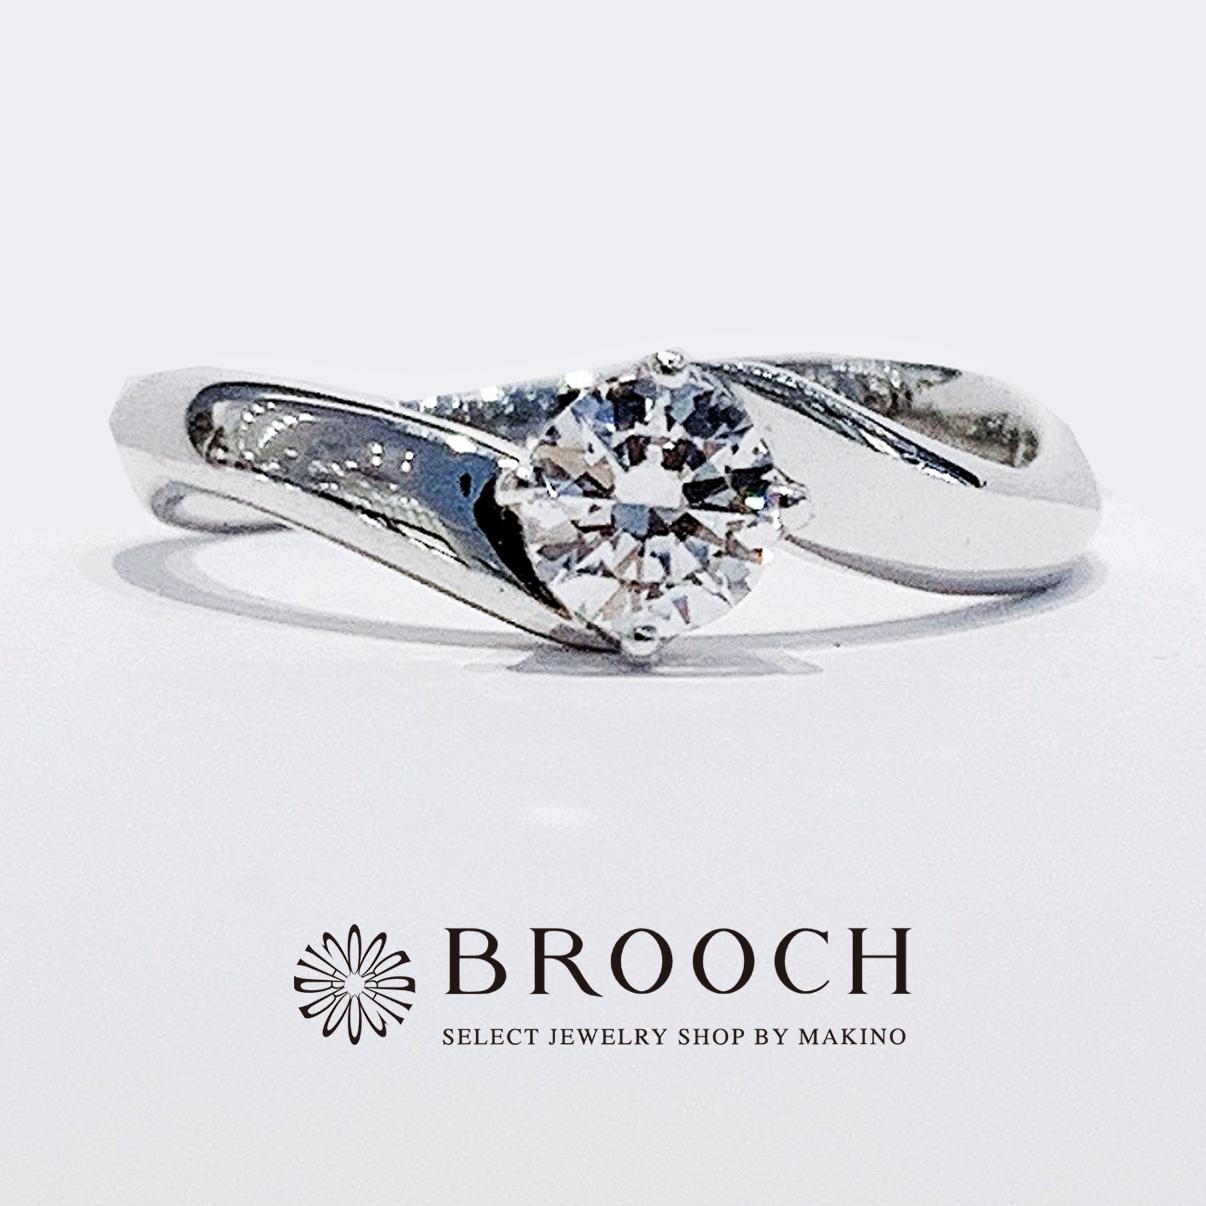 BROOCH 婚約指輪 エンゲージリング 1石太めのウェーブデザイン